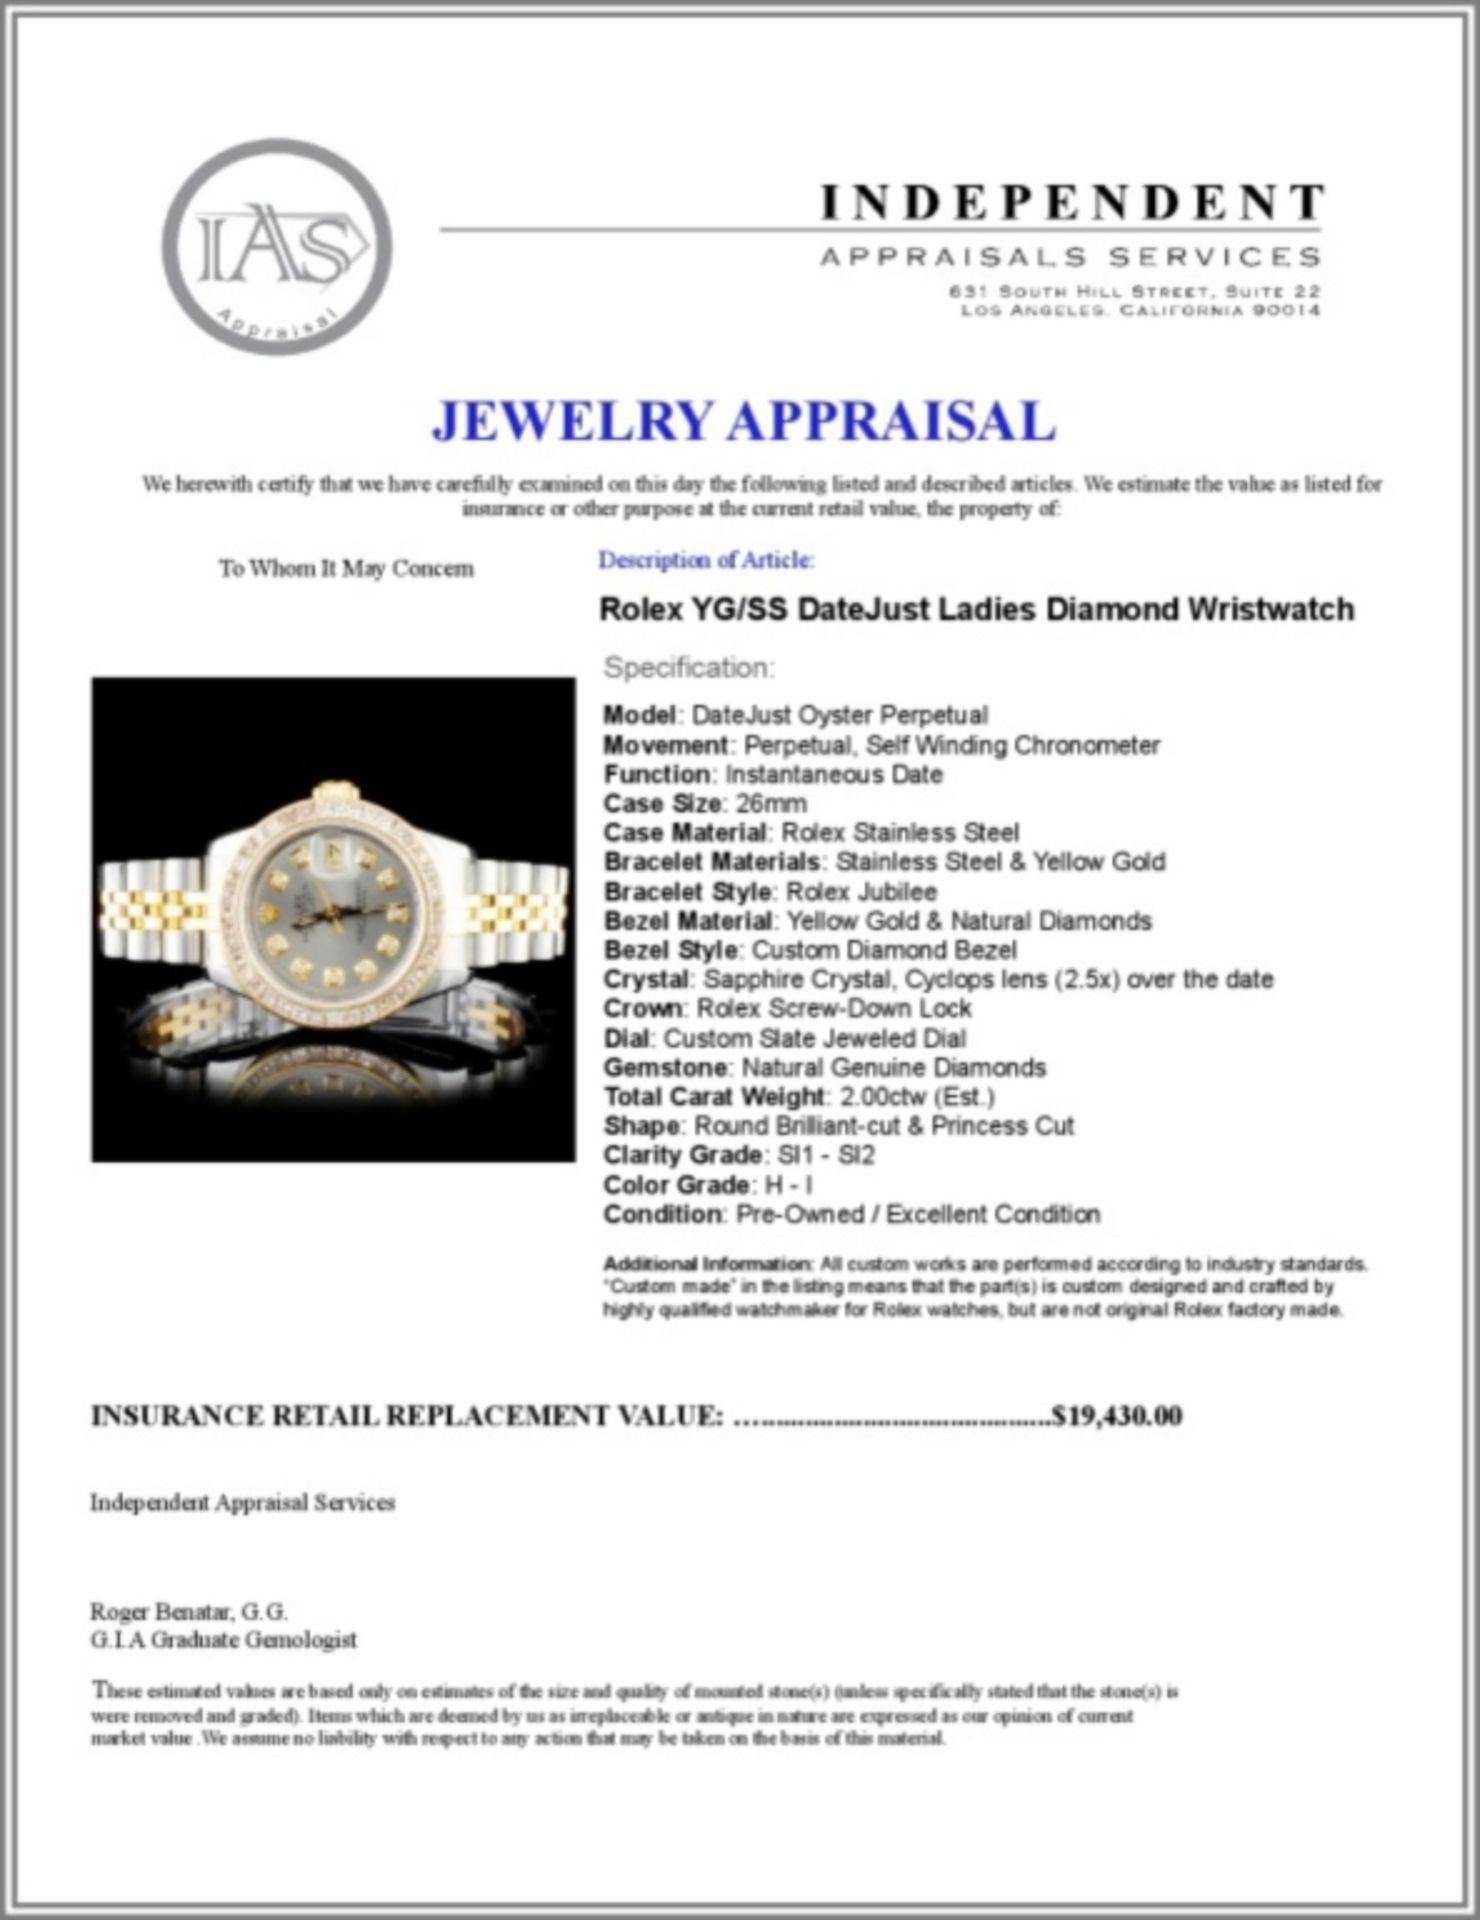 Rolex YG/SS DateJust Ladies Diamond Wristwatch - Image 5 of 5